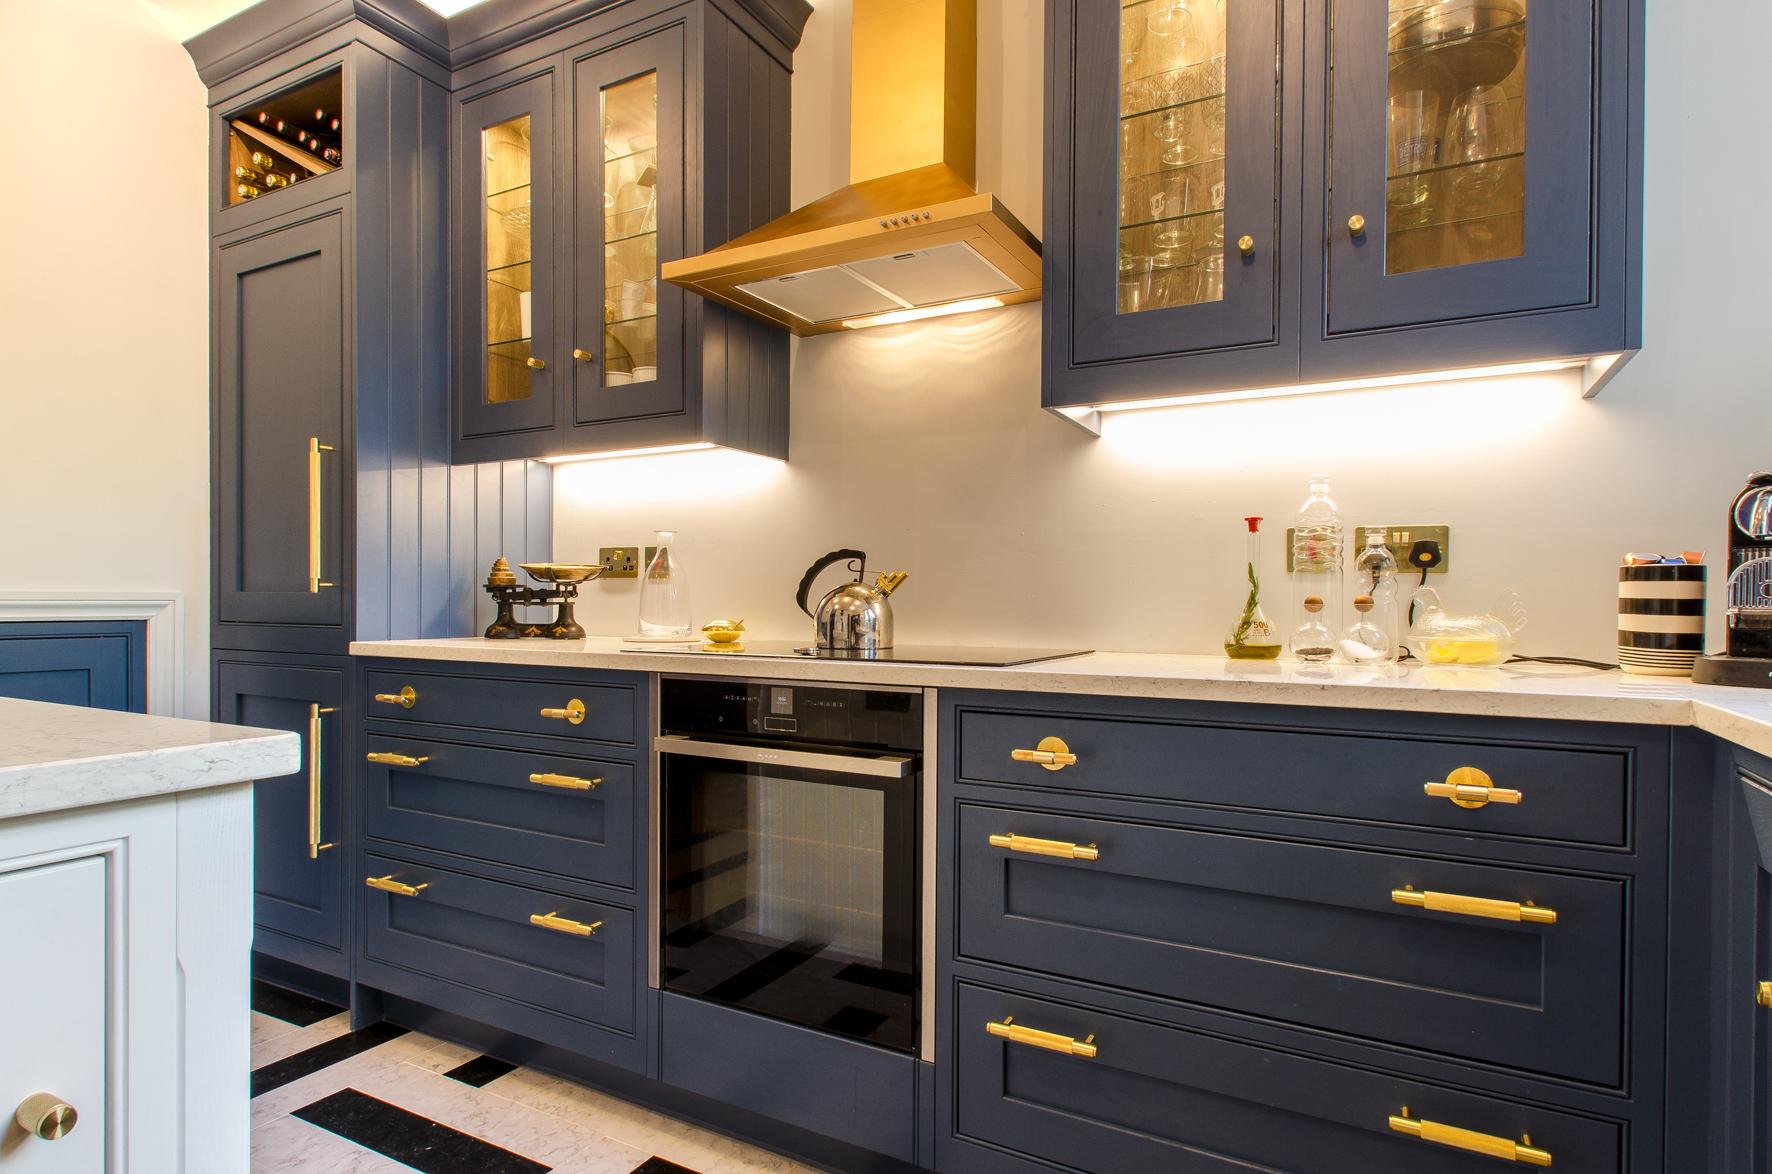 Blue and Brass kitchen